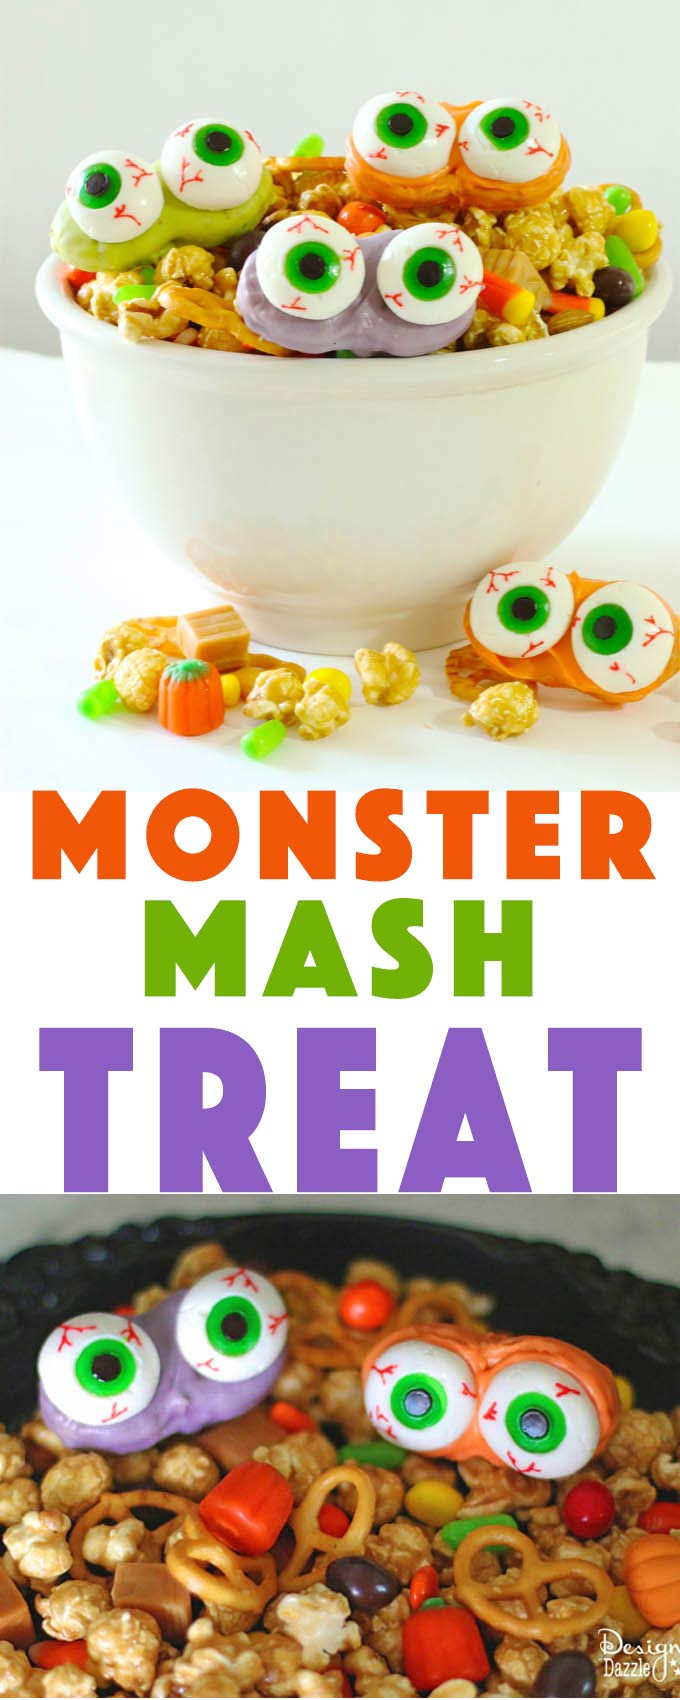 Easy peasy Halloween treat kids will love to make   monster mash halloween treat   halloween snack recipes   halloween treat recipes   how to make monster mash   kid friendly halloween recipes   halloween recipe ideas    Design Dazzle